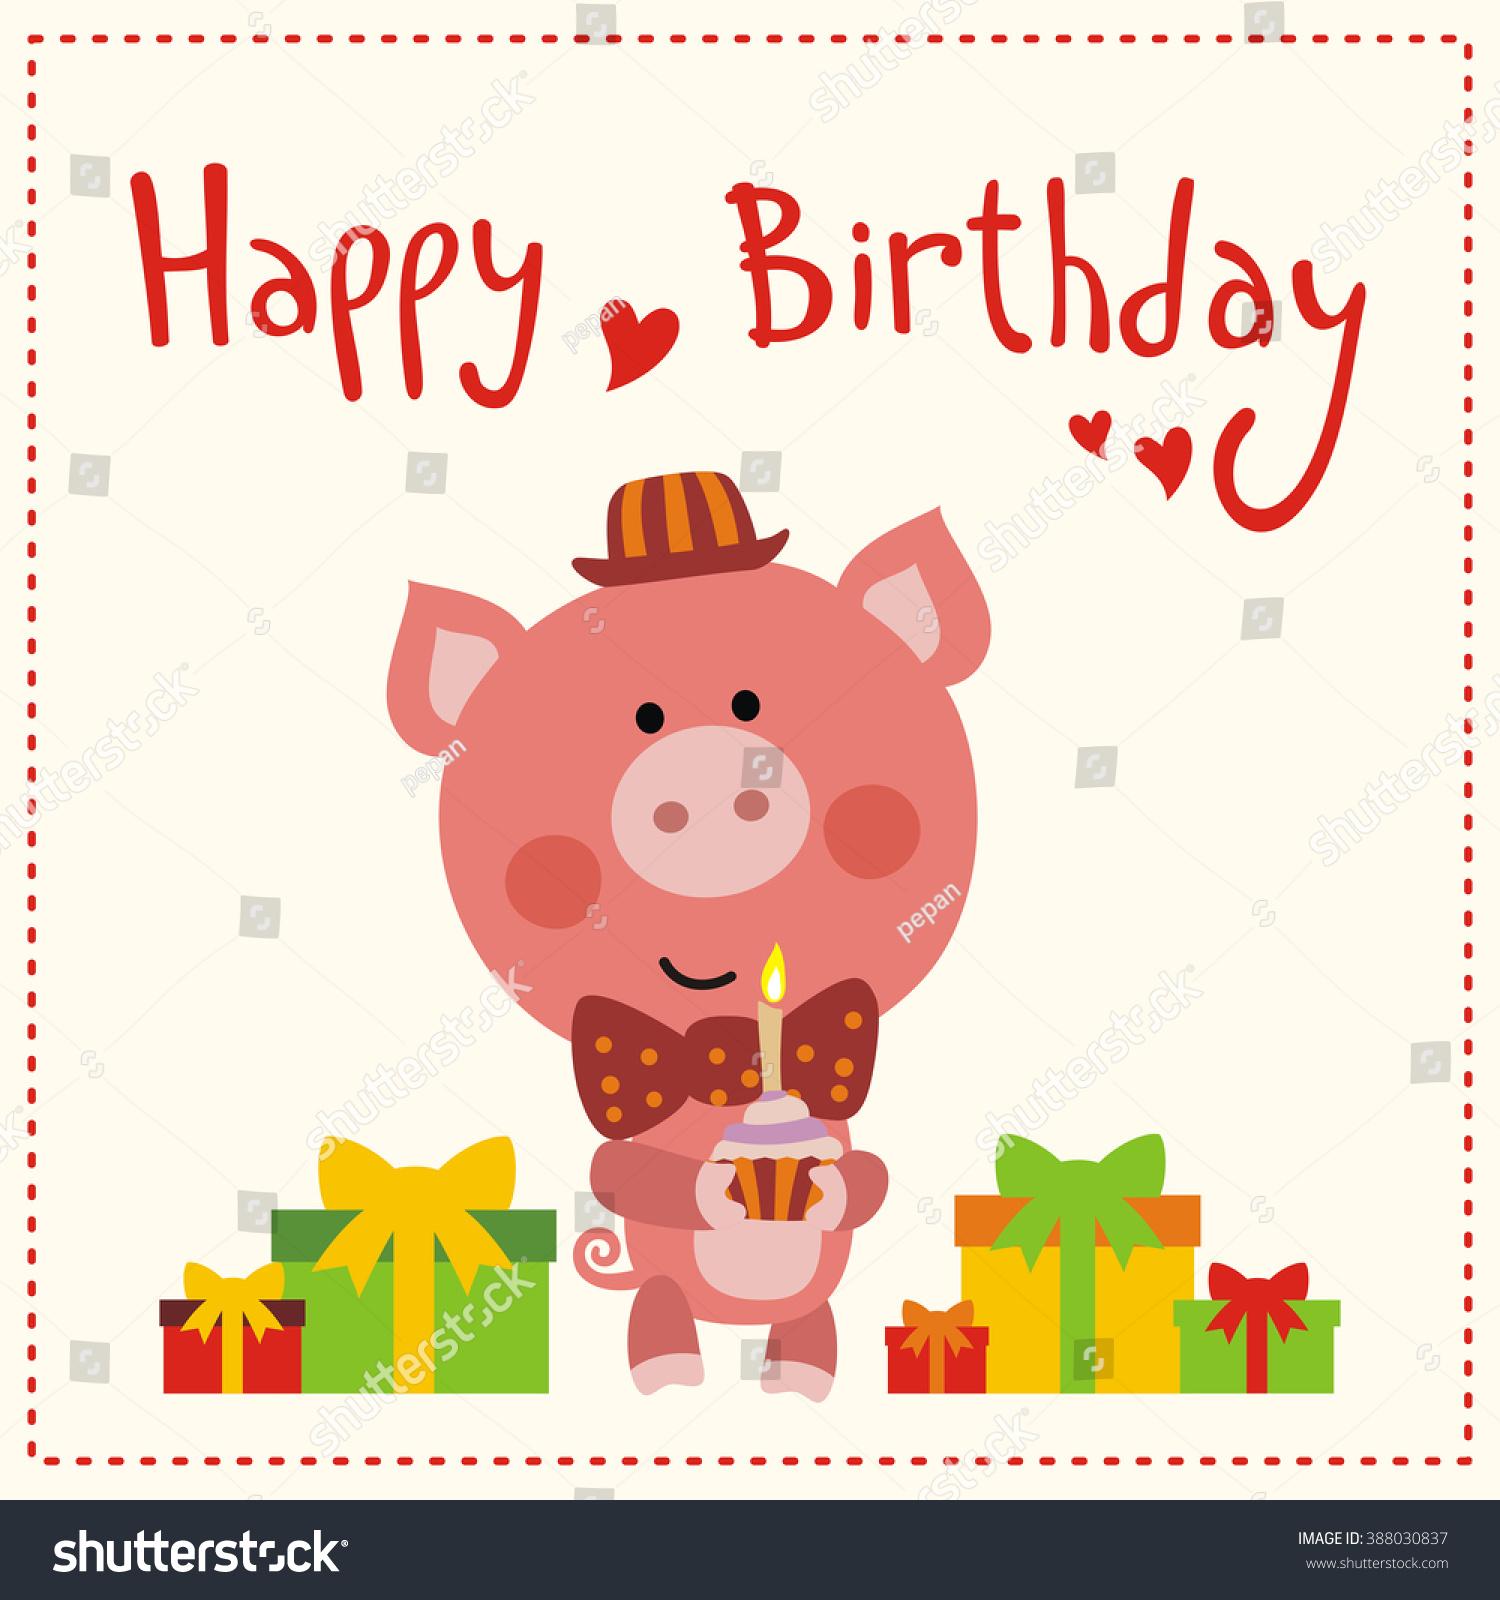 happy birthday cute little pig red stock vector, Birthday card